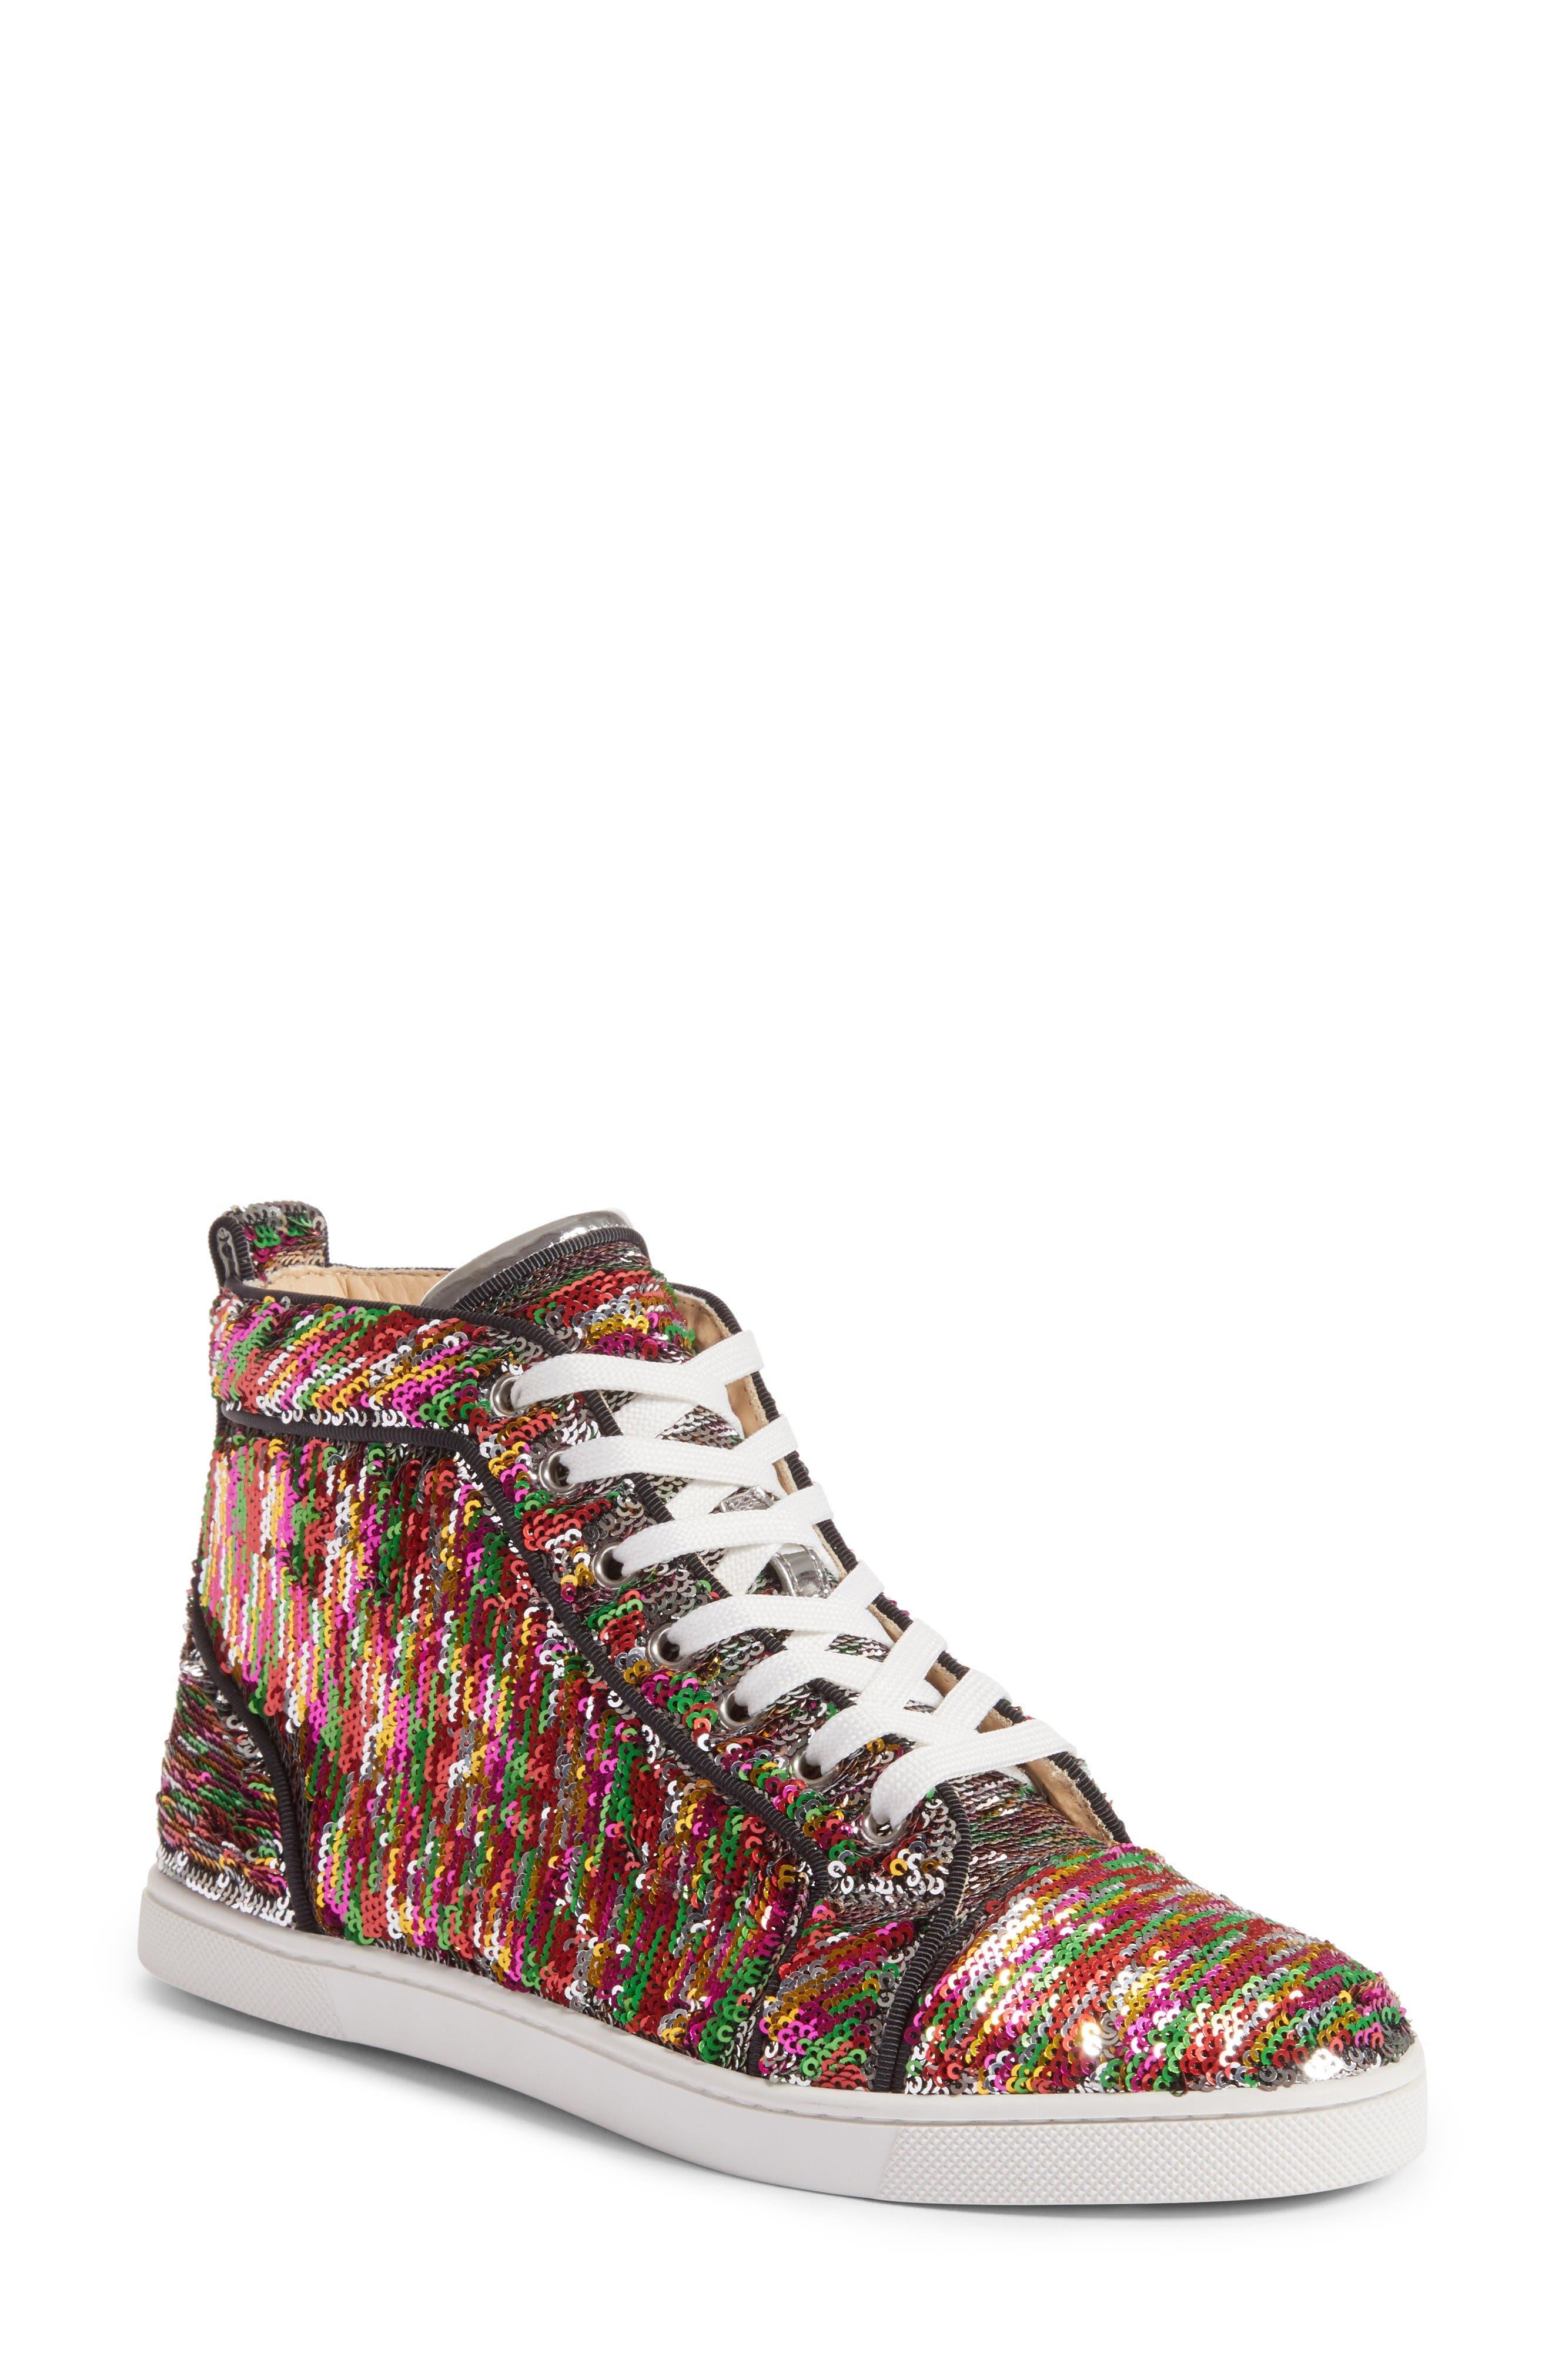 Alternate Image 1 Selected - Christian Louboutin Bip Bip High Top Sneaker (Women)